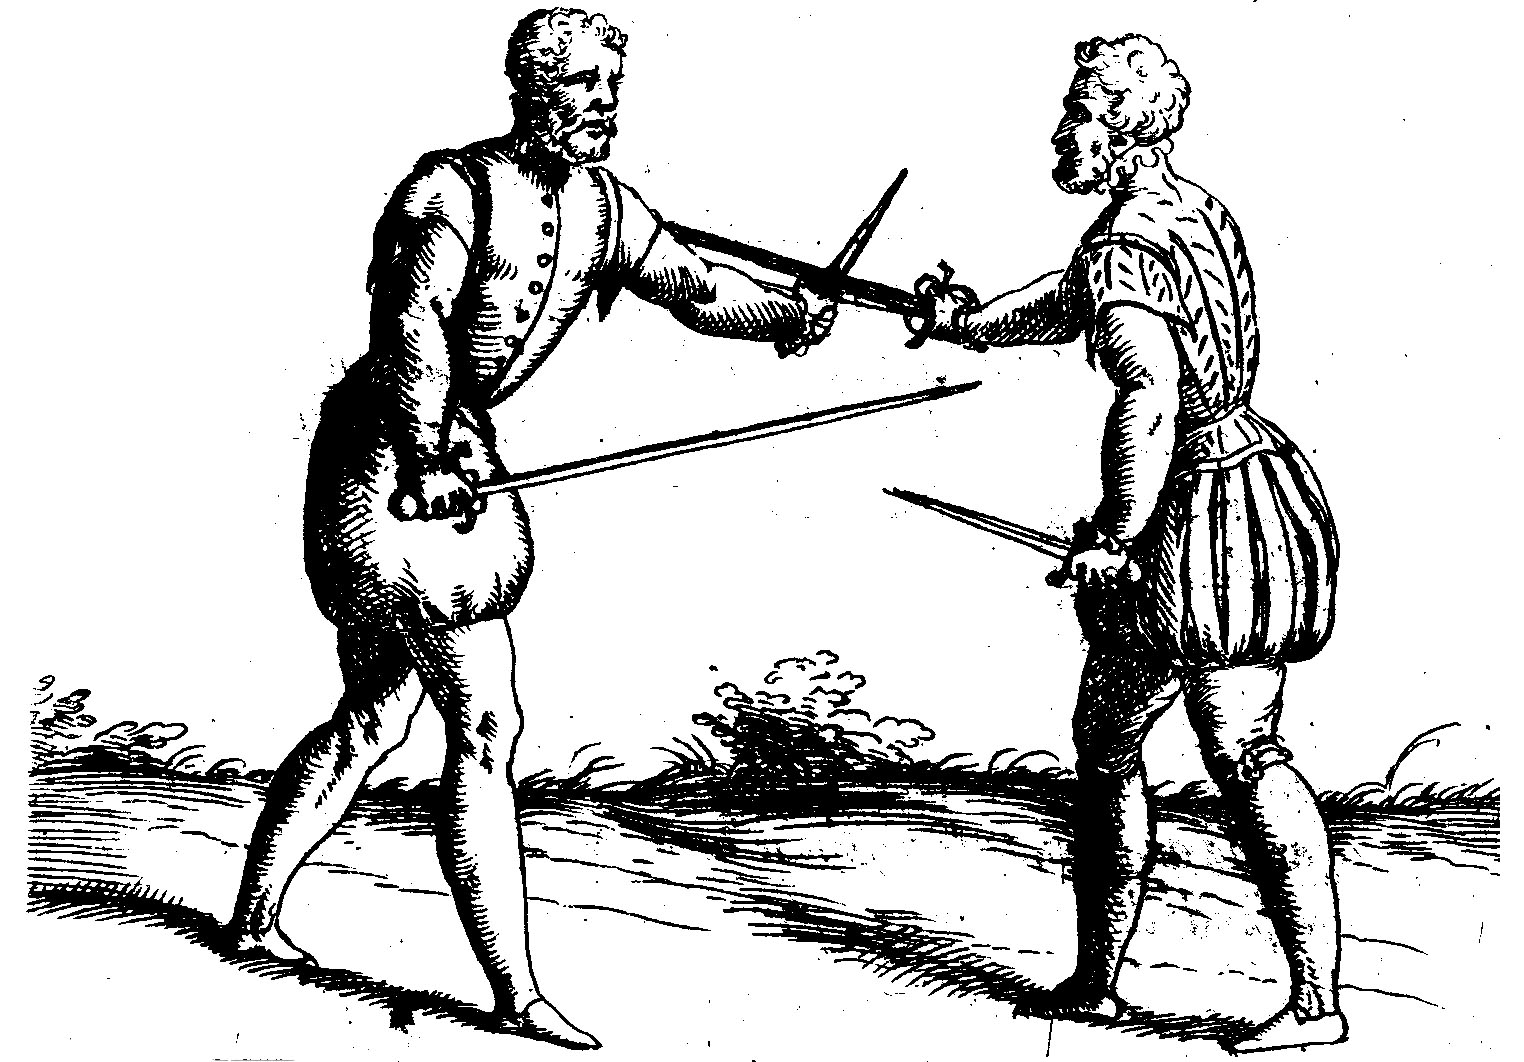 épée & poignard - Di Grassi